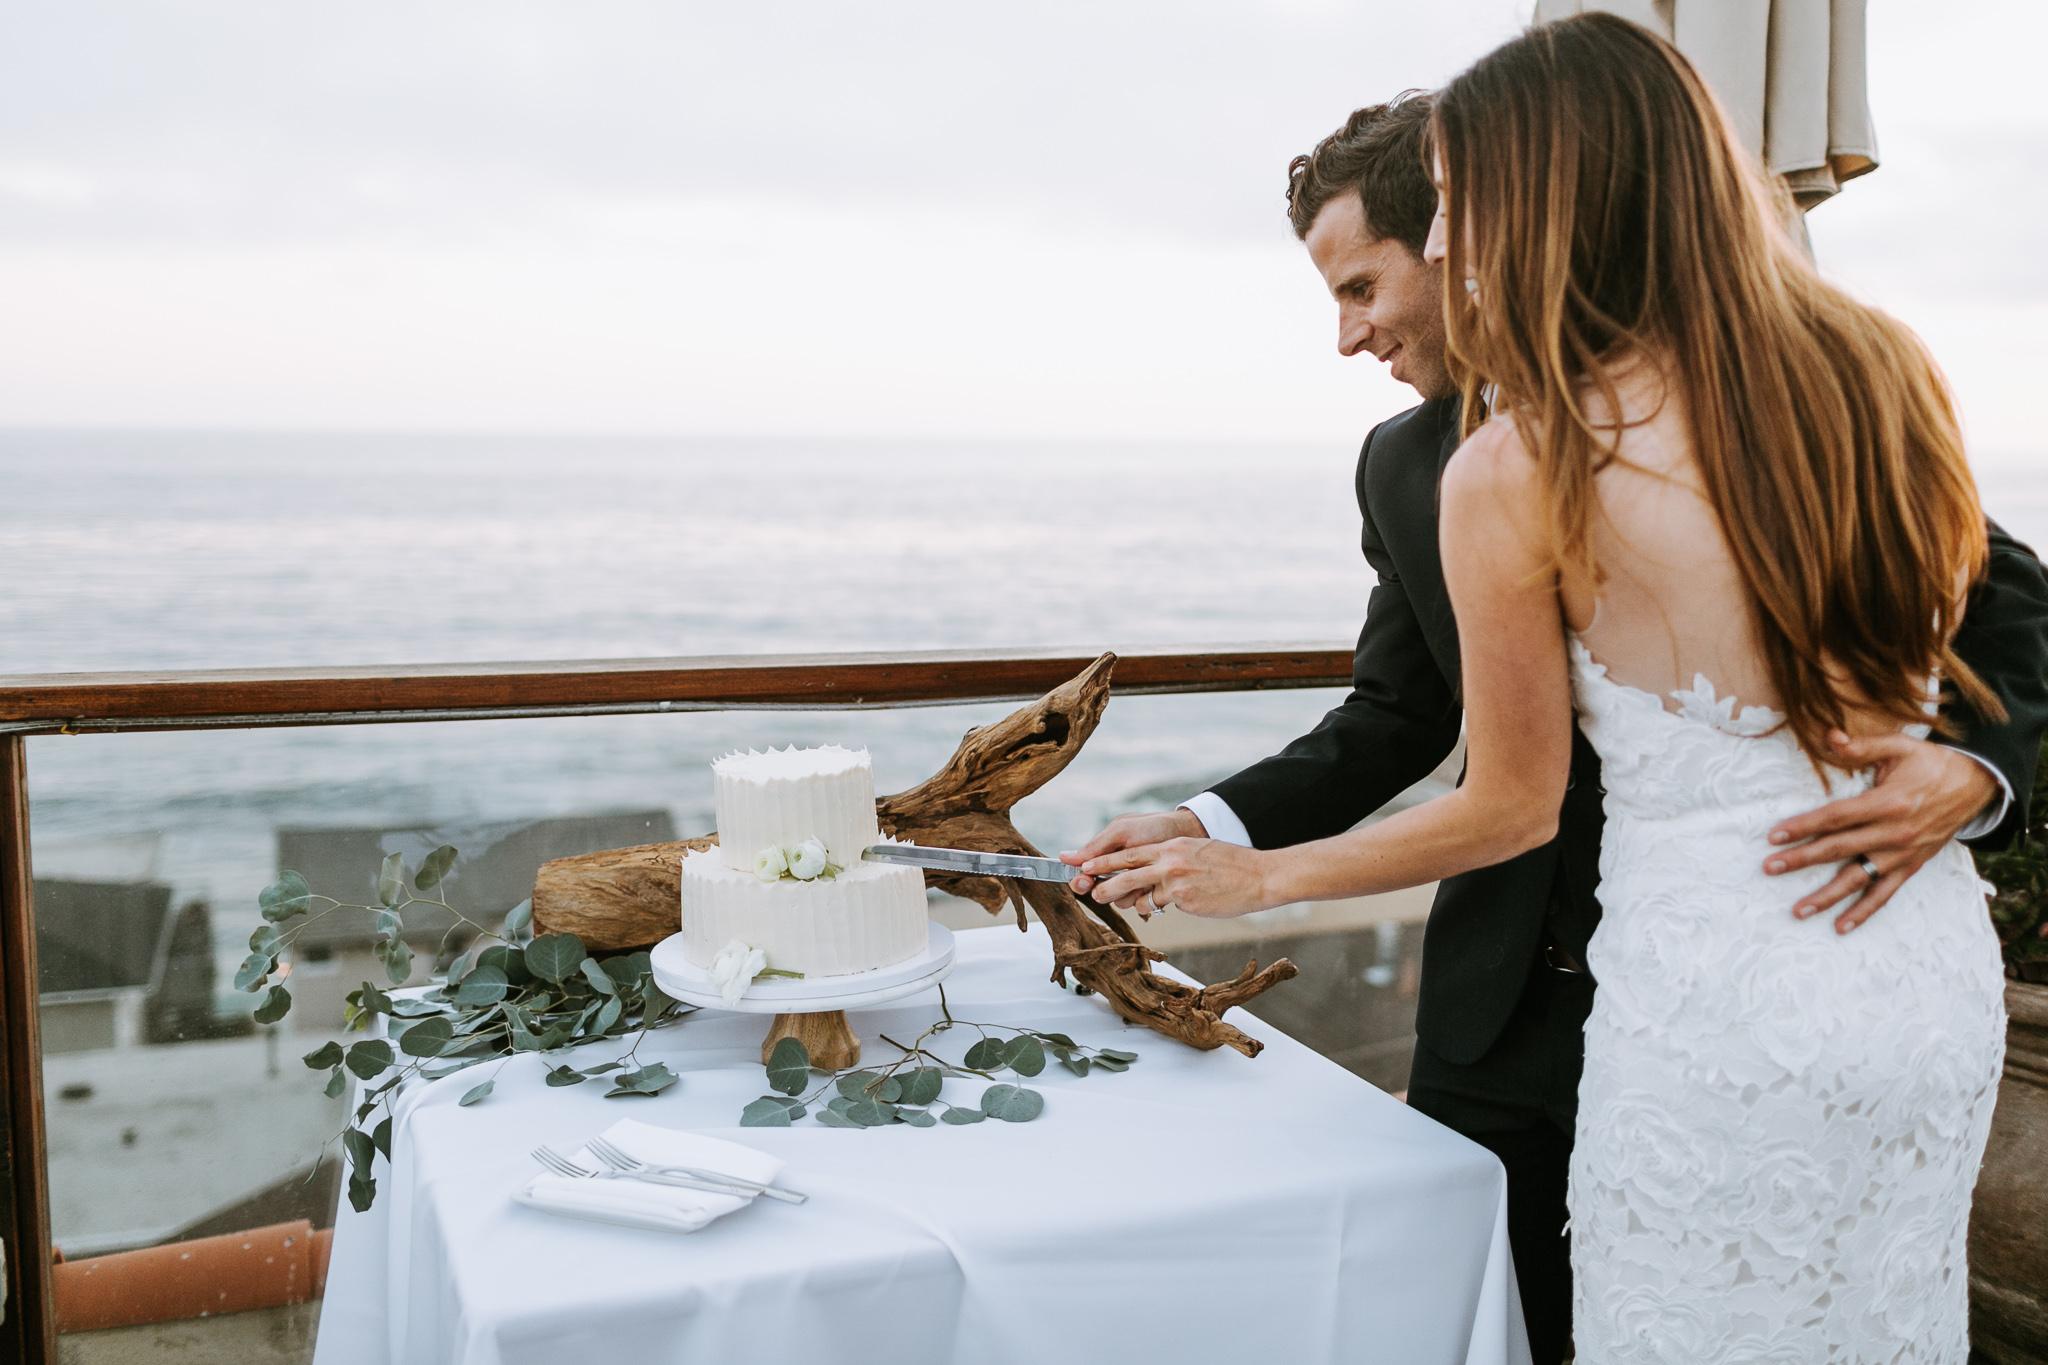 LagunaBeach-WeddingPhotographer-60.jpg